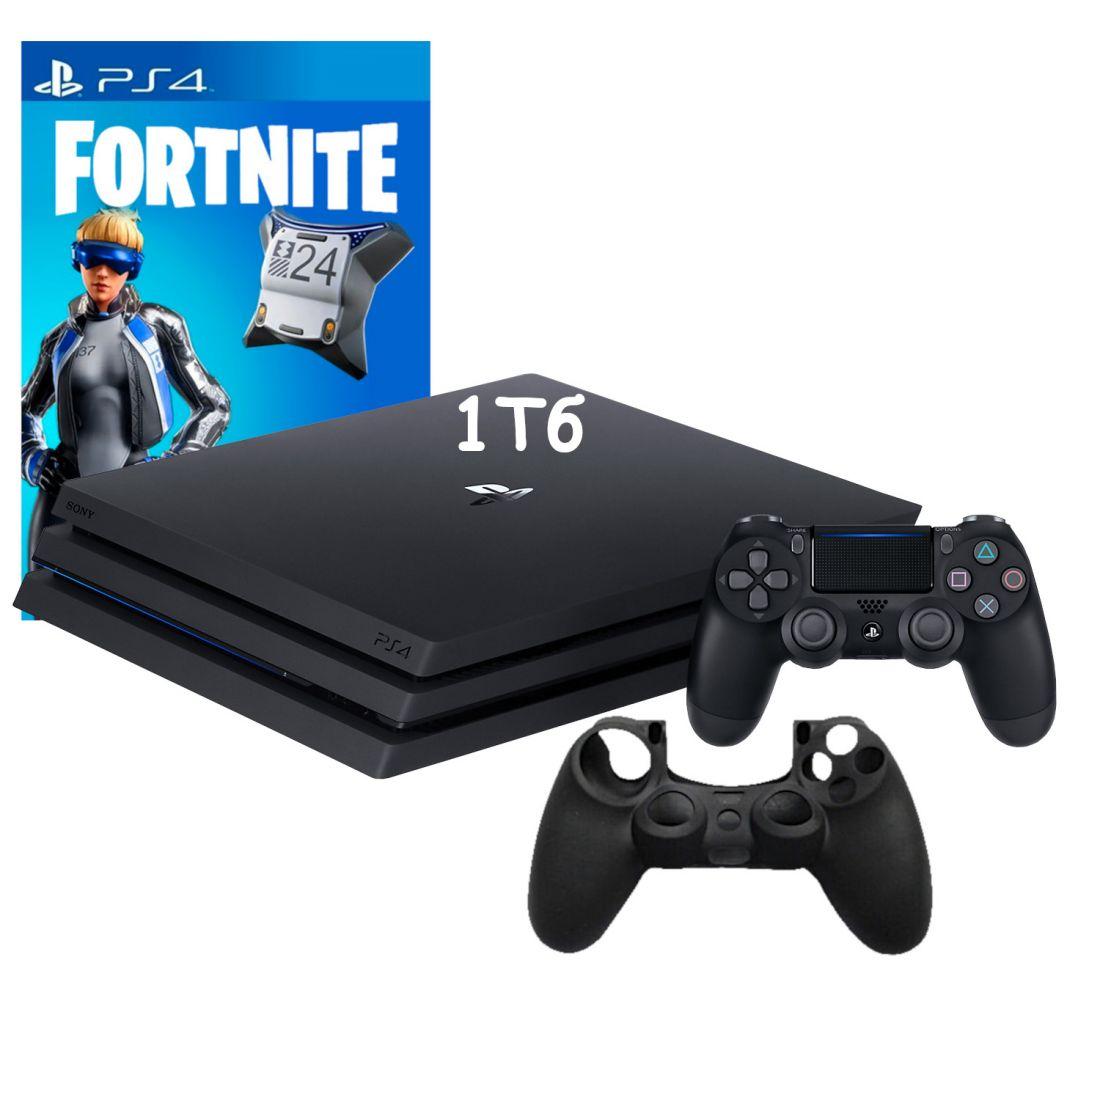 Sony PlayStation 4 Pro 1Tb ( CUH-7216B ) +Игра Fortnite Neo Versa + Силиконовый чехол для джойстика